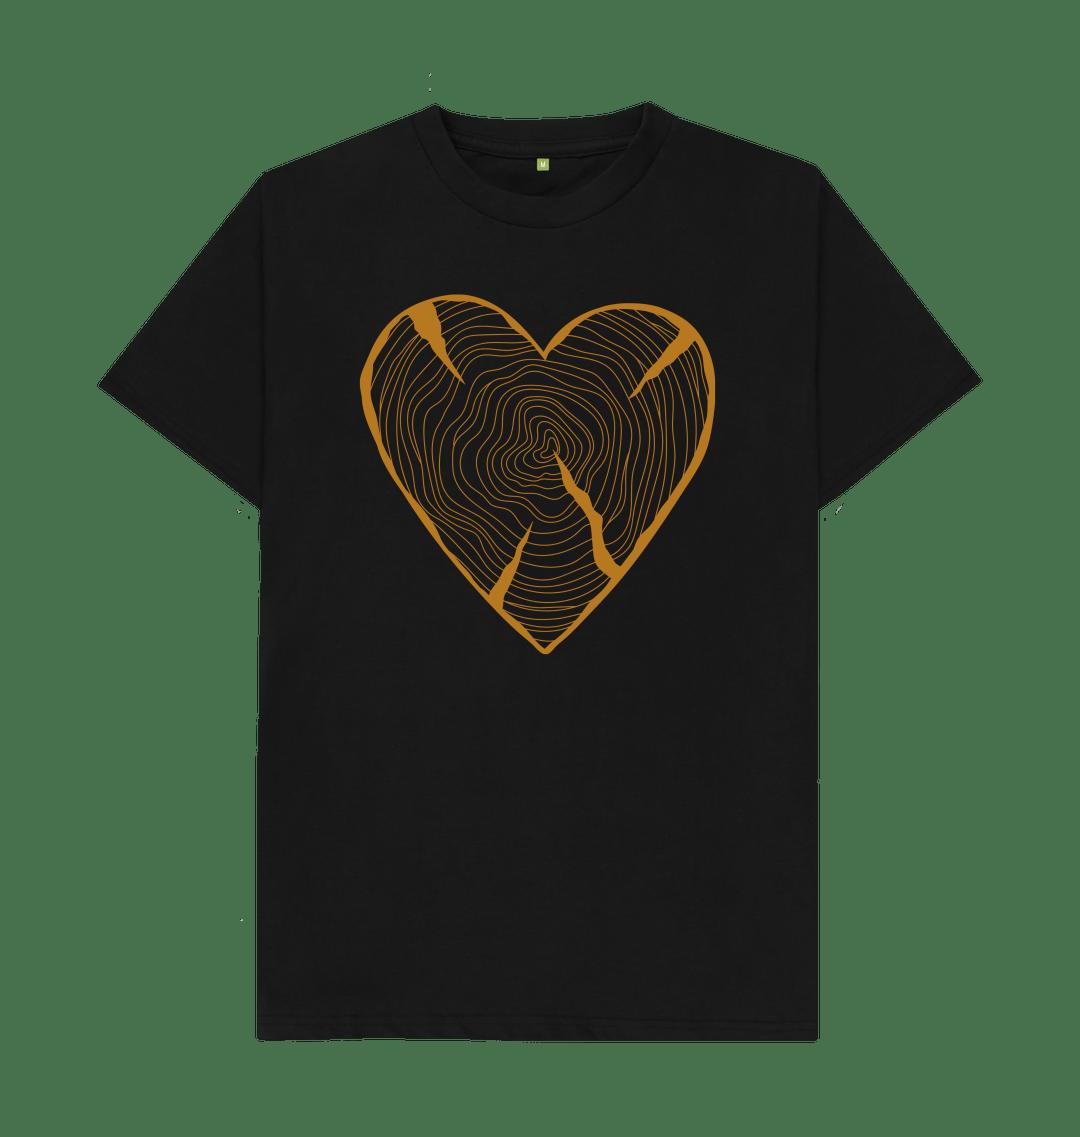 Nature Lovers T Shirt Adventure Heart Tree Trunk Rings black